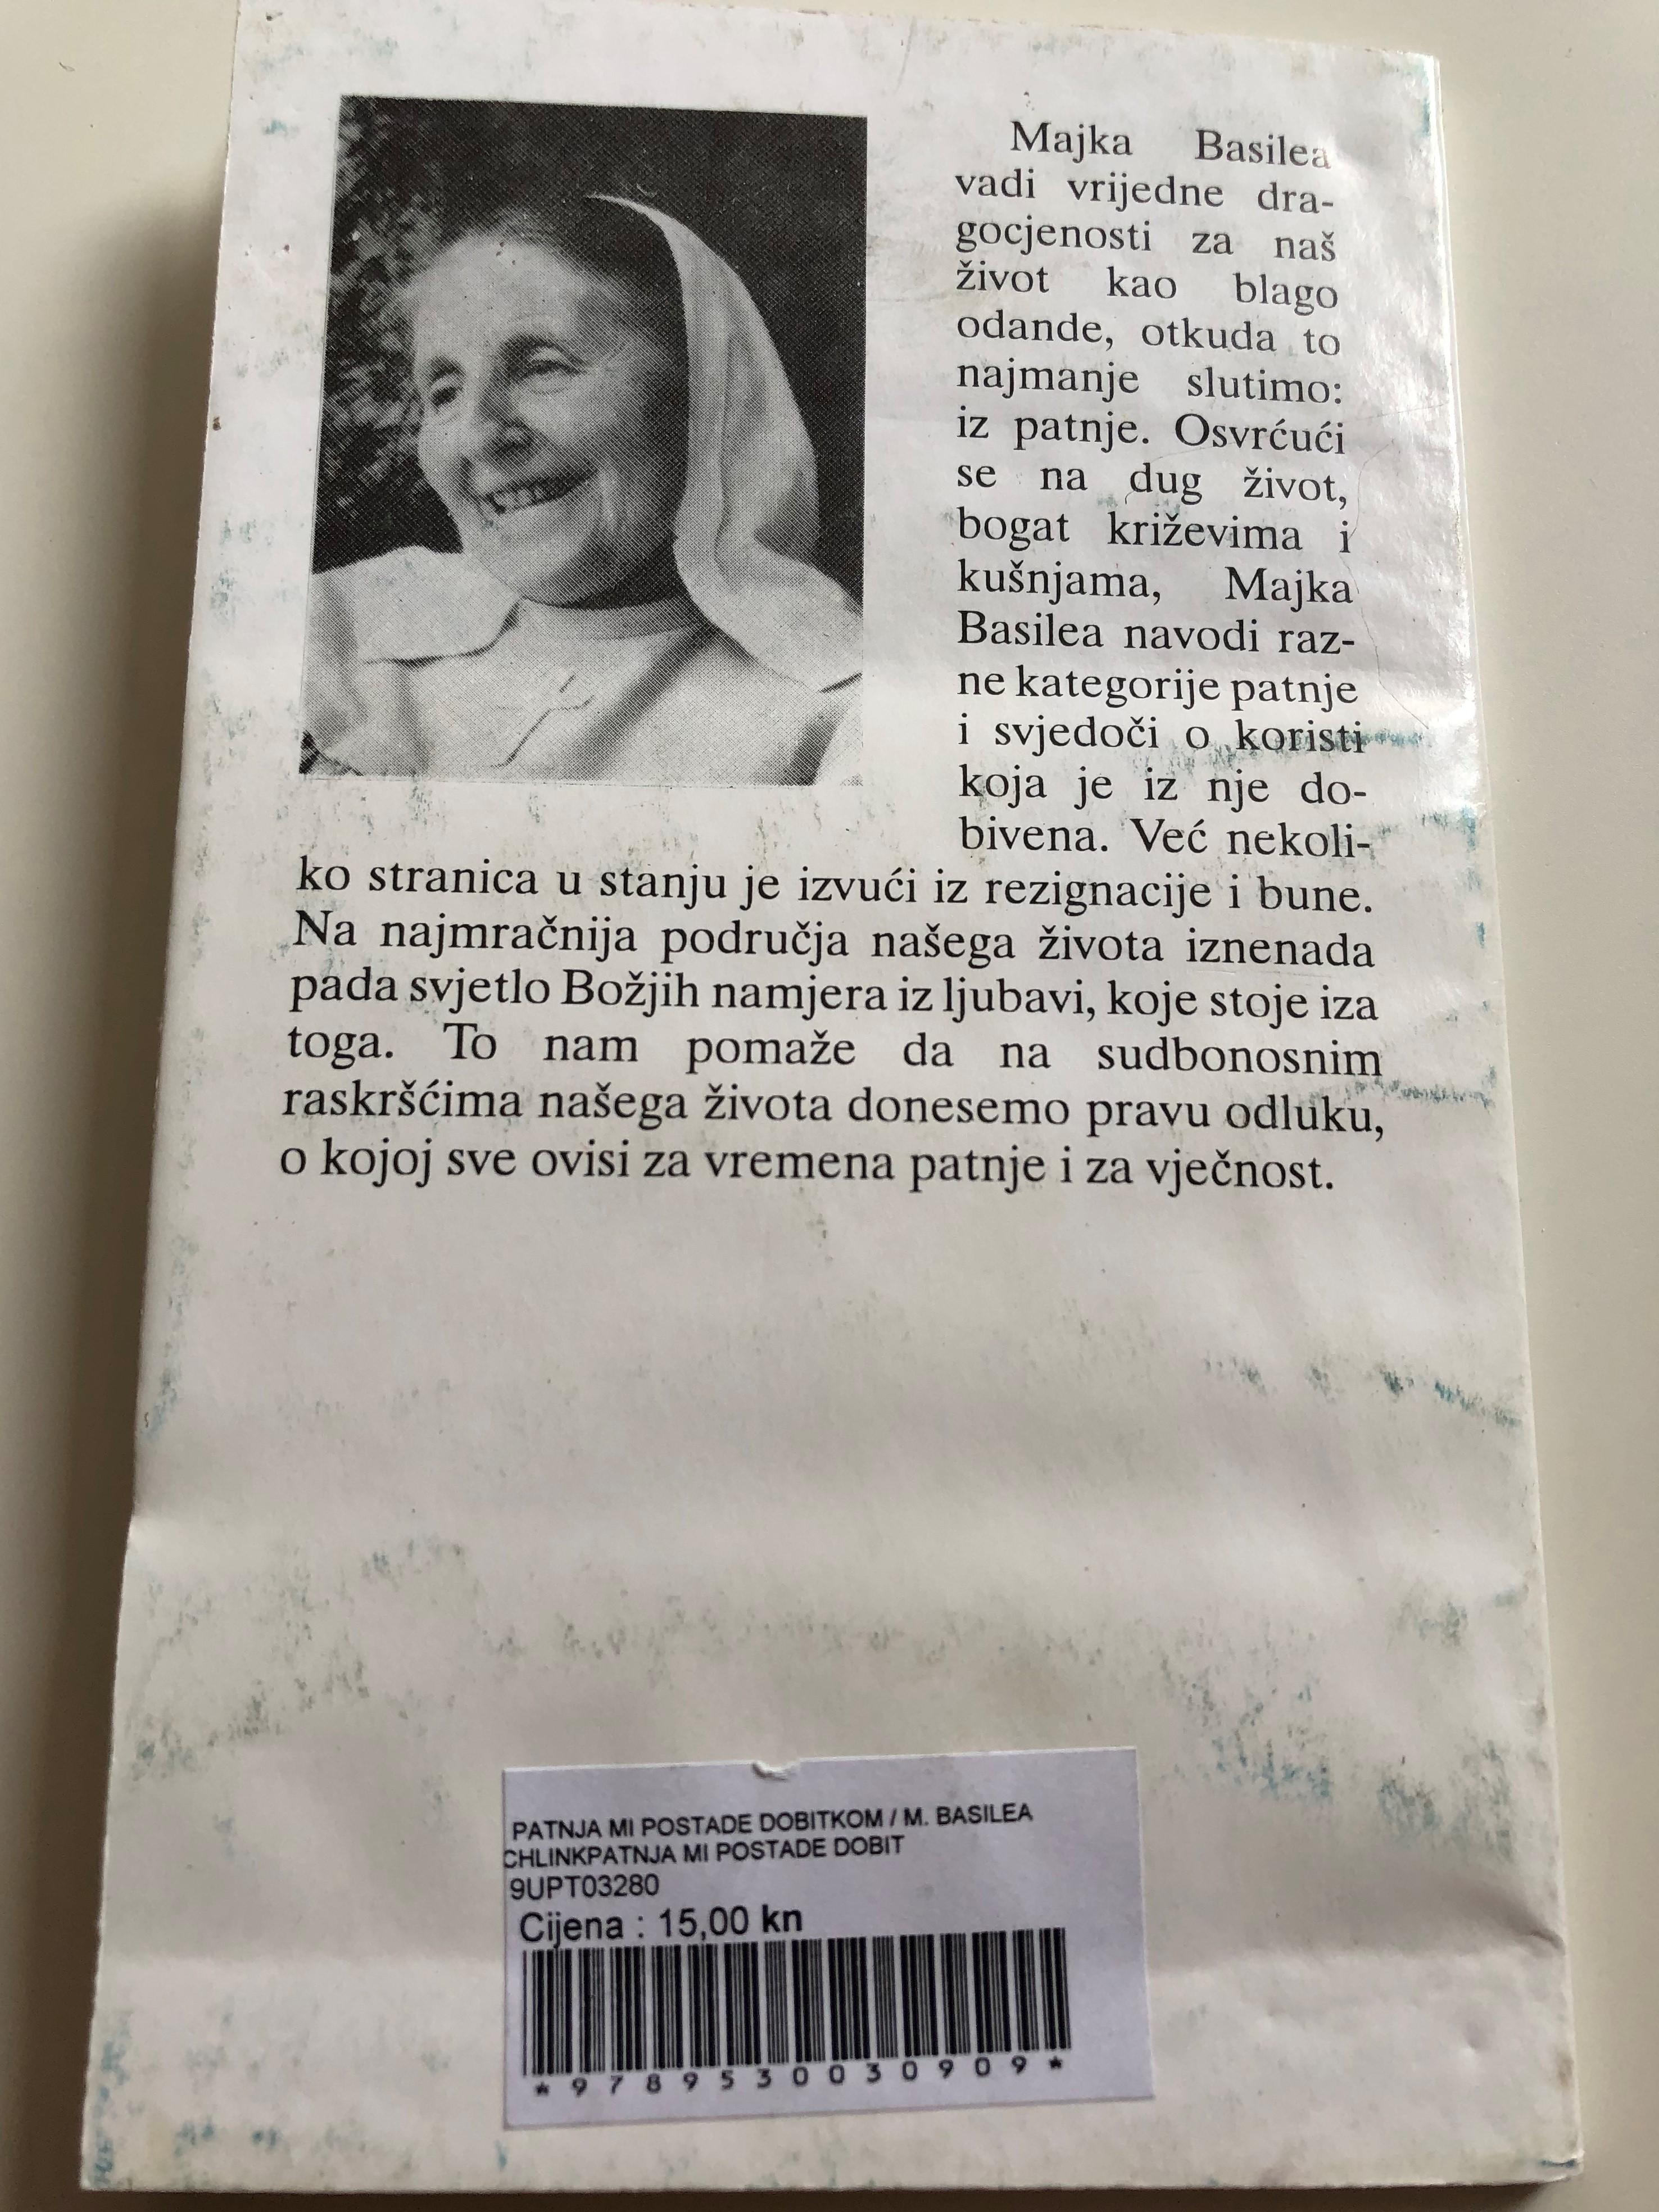 patnja-mi-postade-dobitkom-by-m.-basilea-schlink-croatian-translation-of-zum-cewinn-ward-mir-das-leid-9.jpg